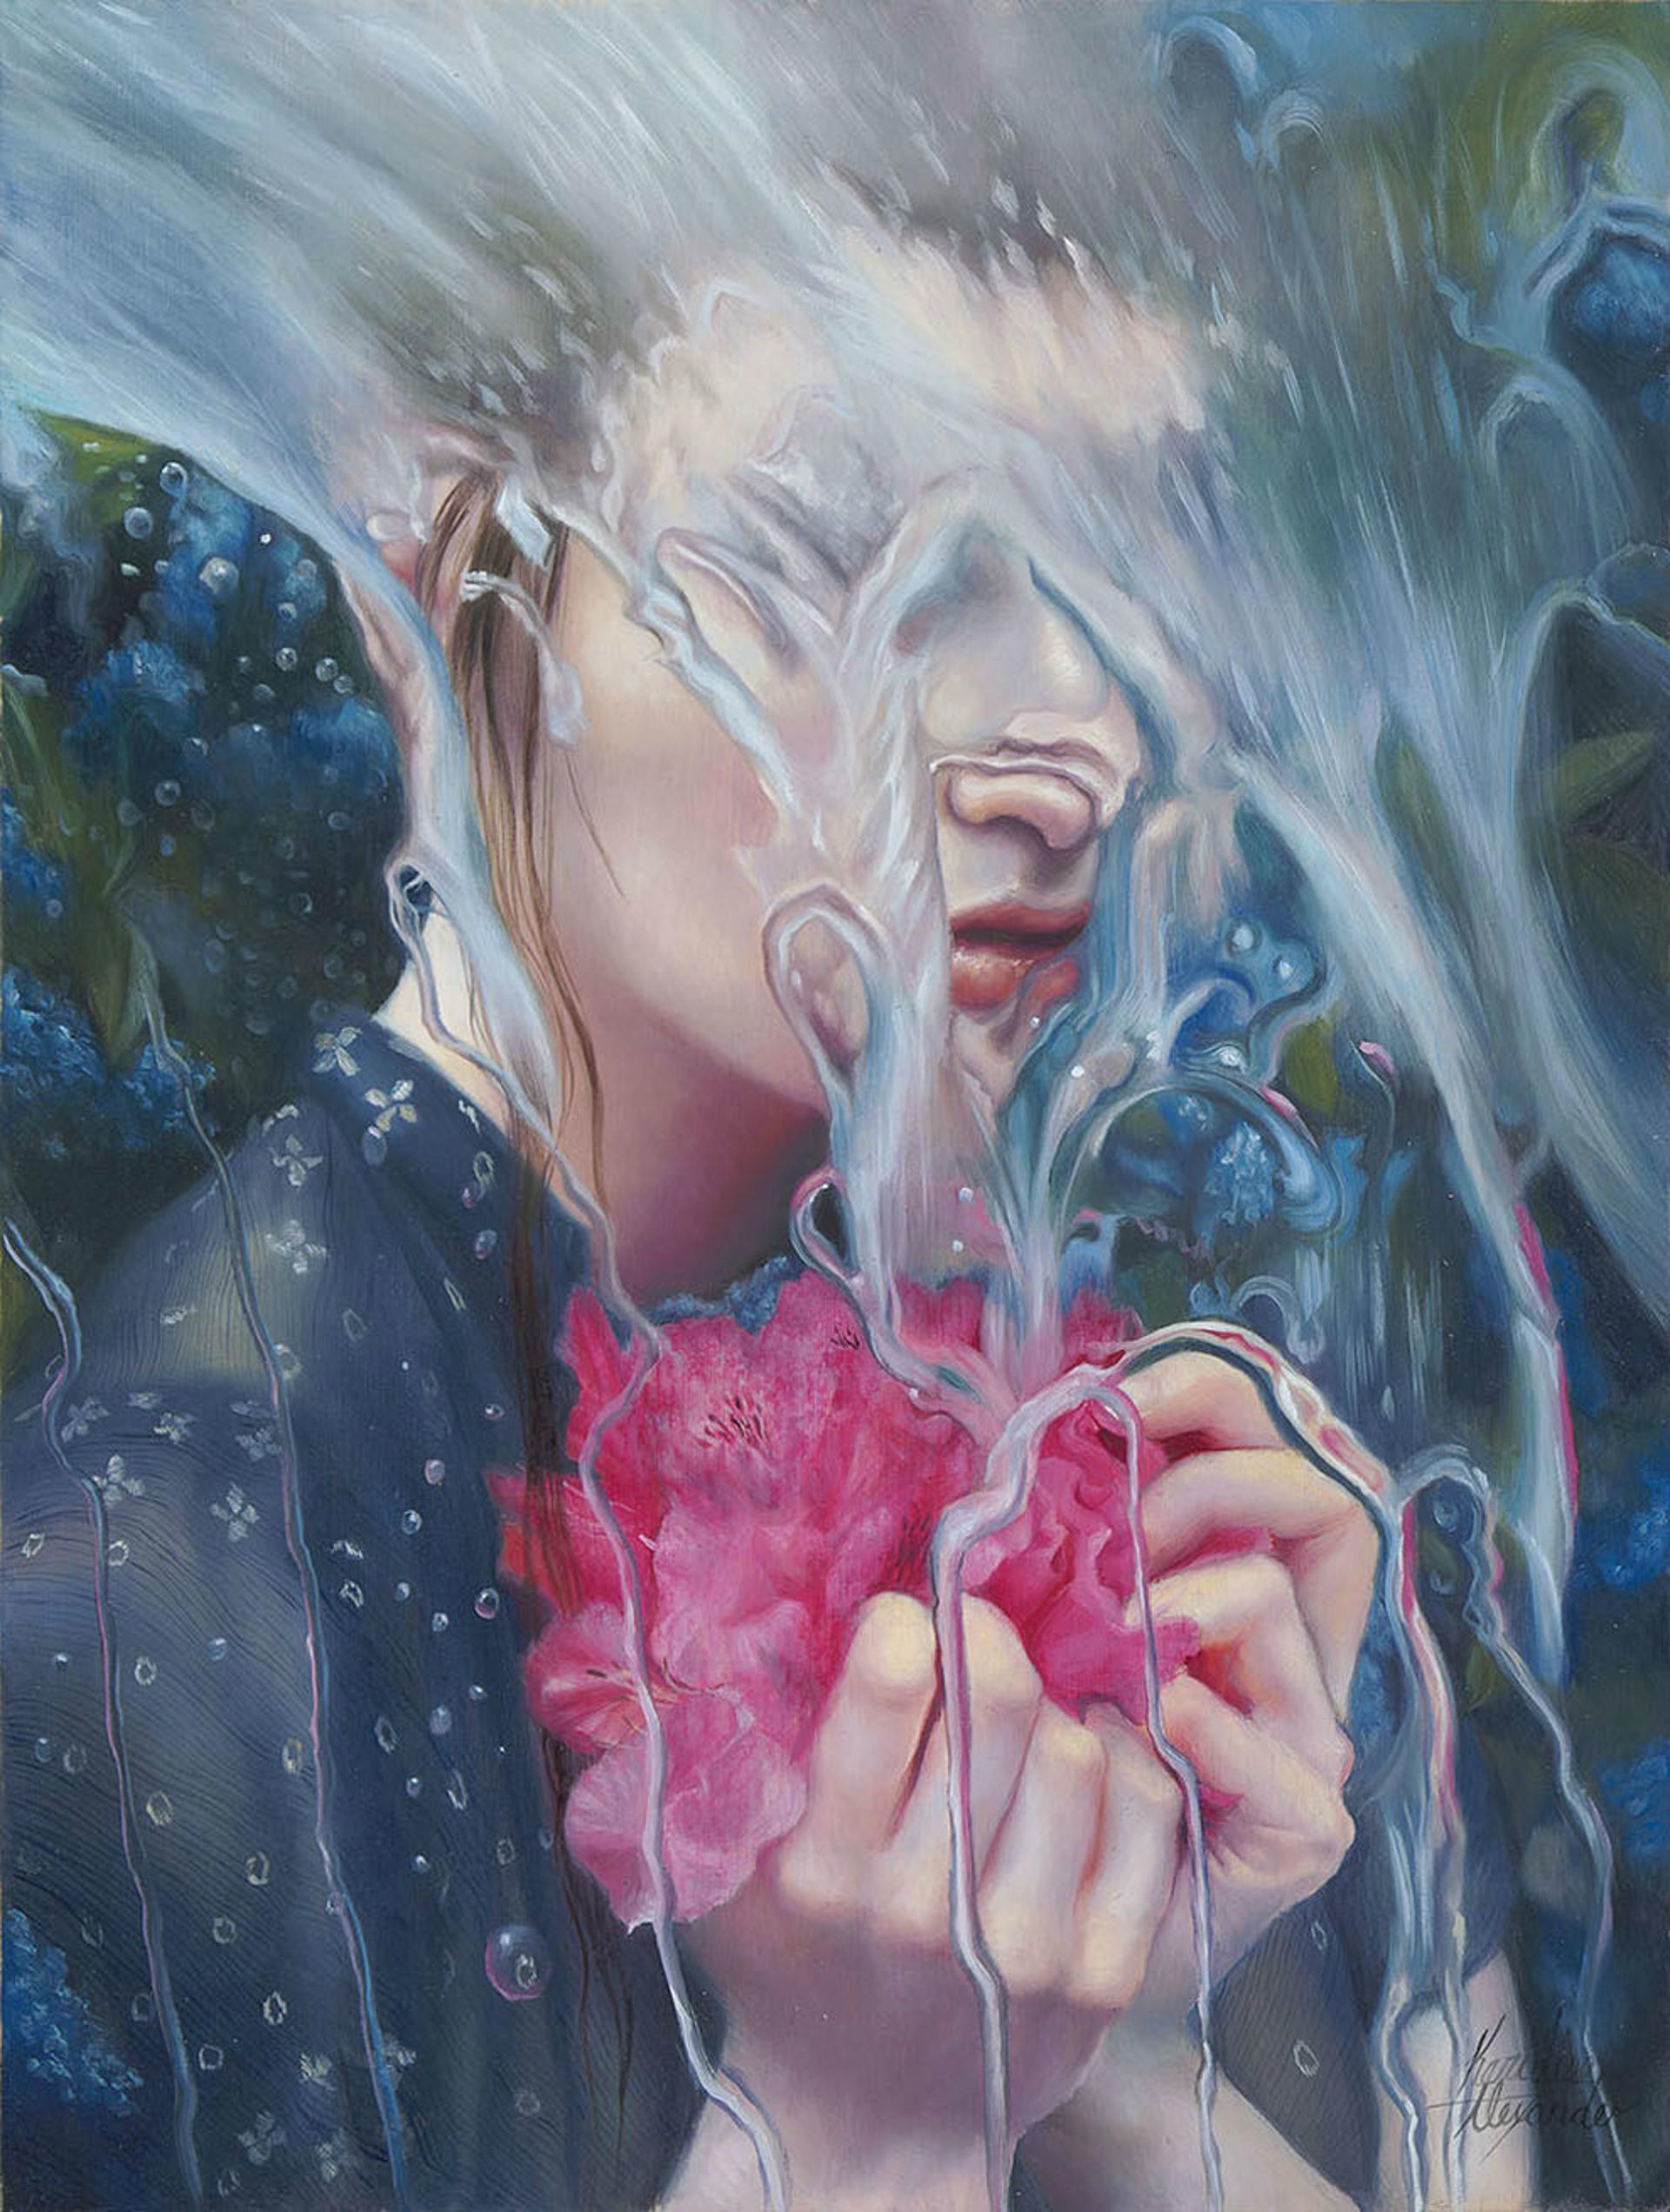 Almost Real by Kari-Lise Alexander